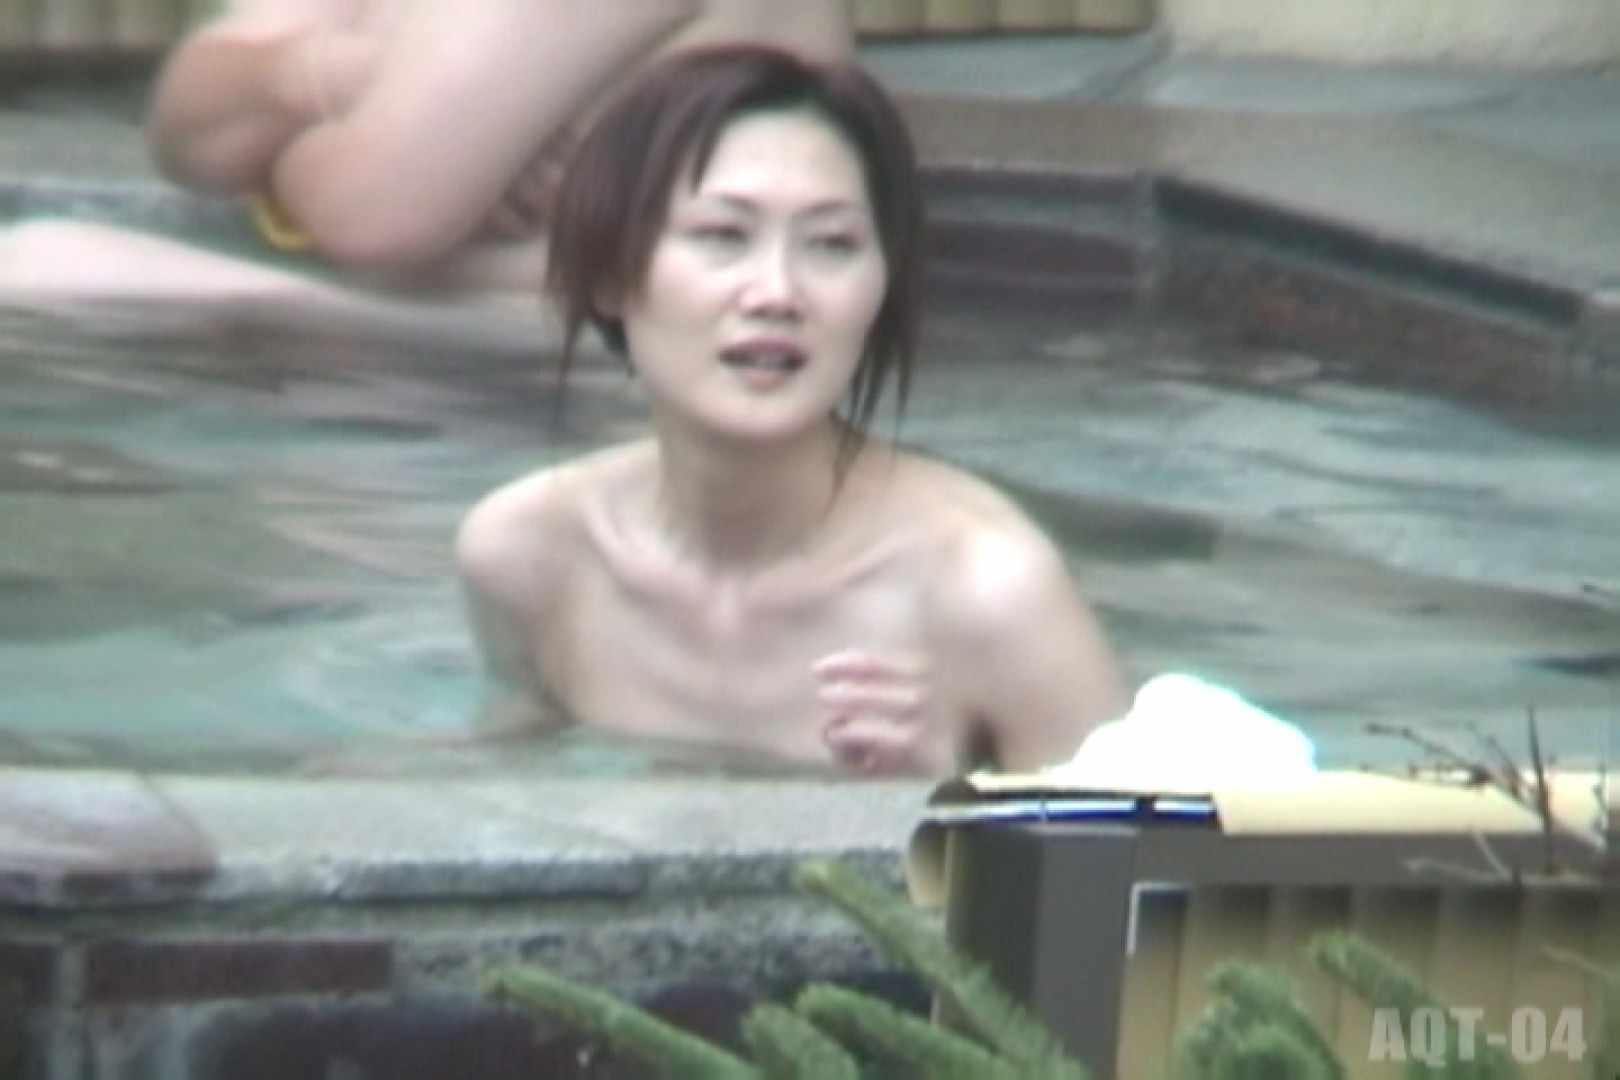 Aquaな露天風呂Vol.739 露天風呂突入 | 盗撮師作品  88pic 61